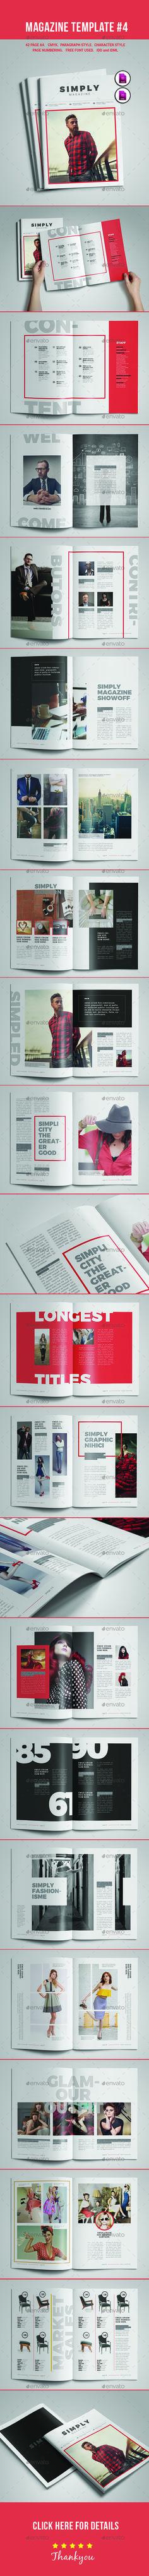 Magazine Template #4 - Magazines Print Templates Download here : https://graphicriver.net/item/magazine-template-4/17485396?s_rank=137&ref=Al-fatih